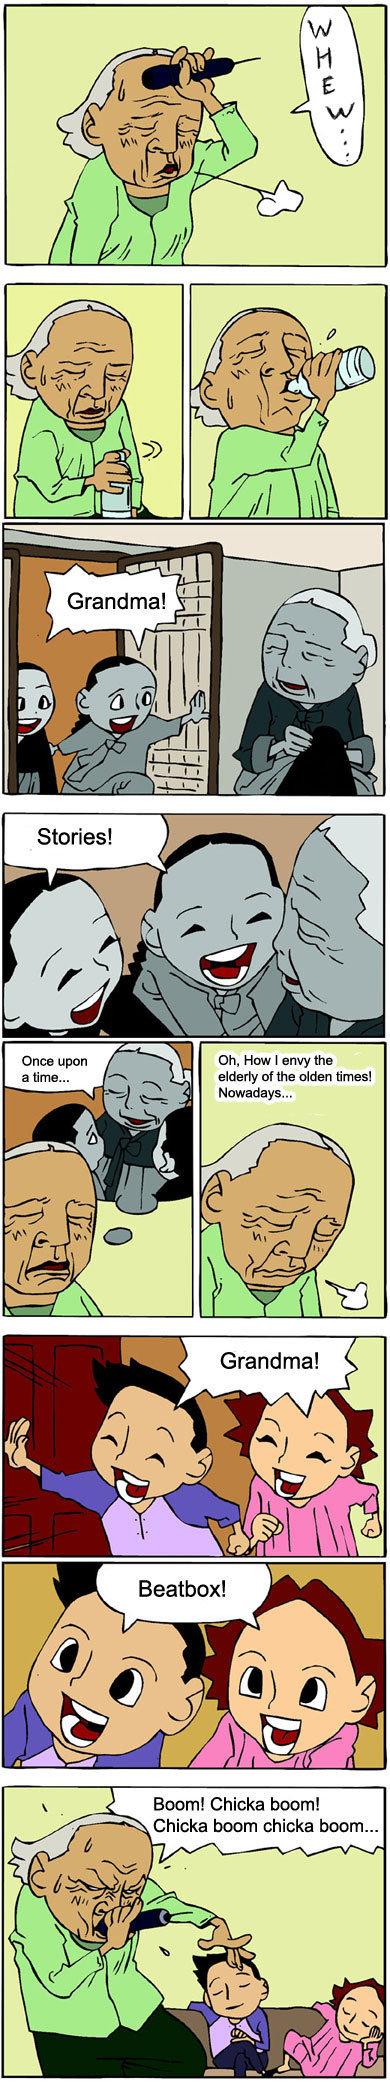 Kinda of true,. Spare thumb because it is funny. beast ASS grandma